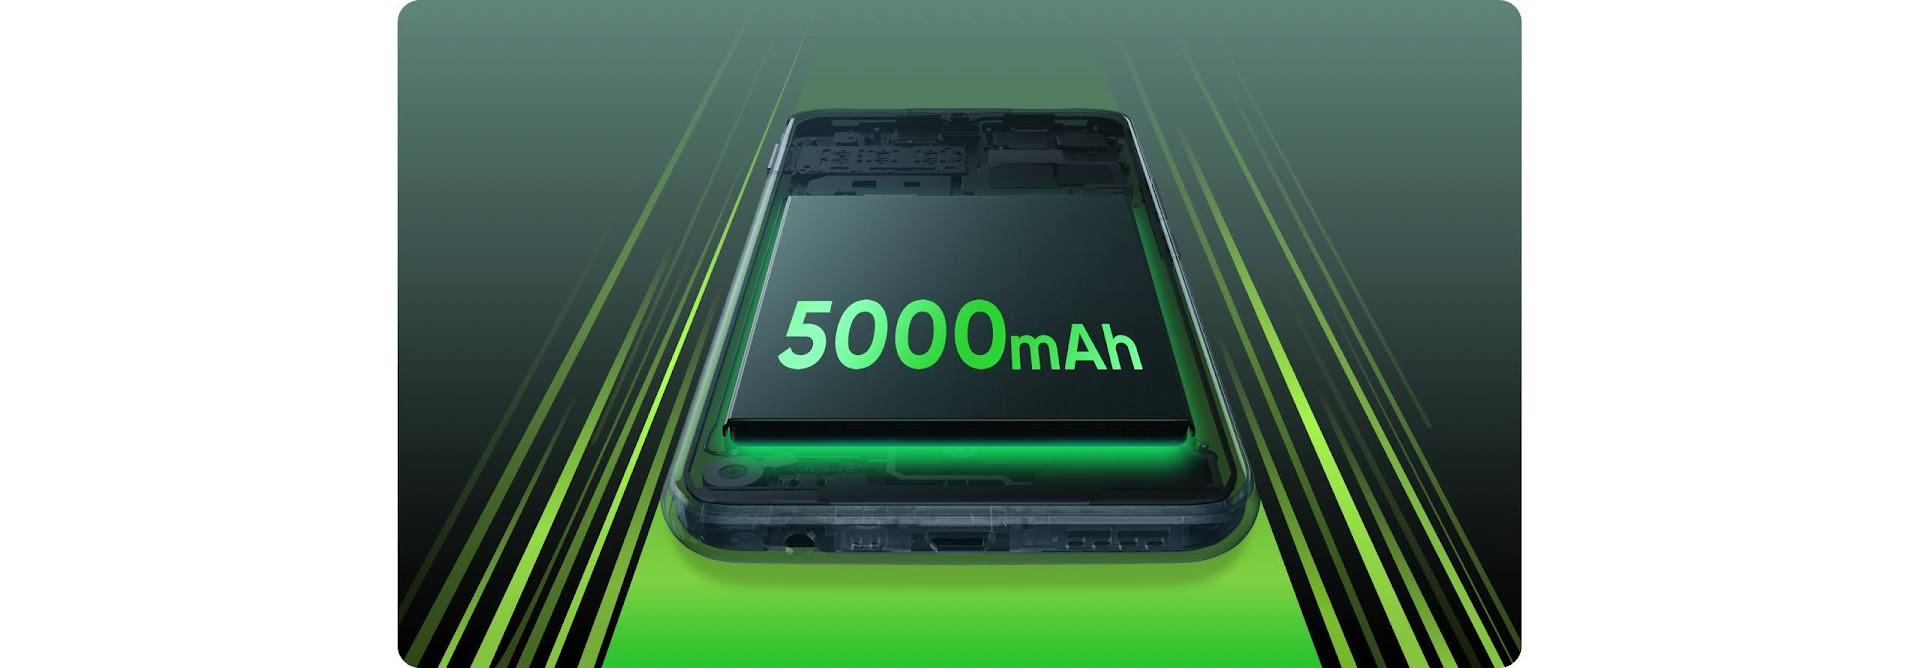 realme c17 5000mah battery